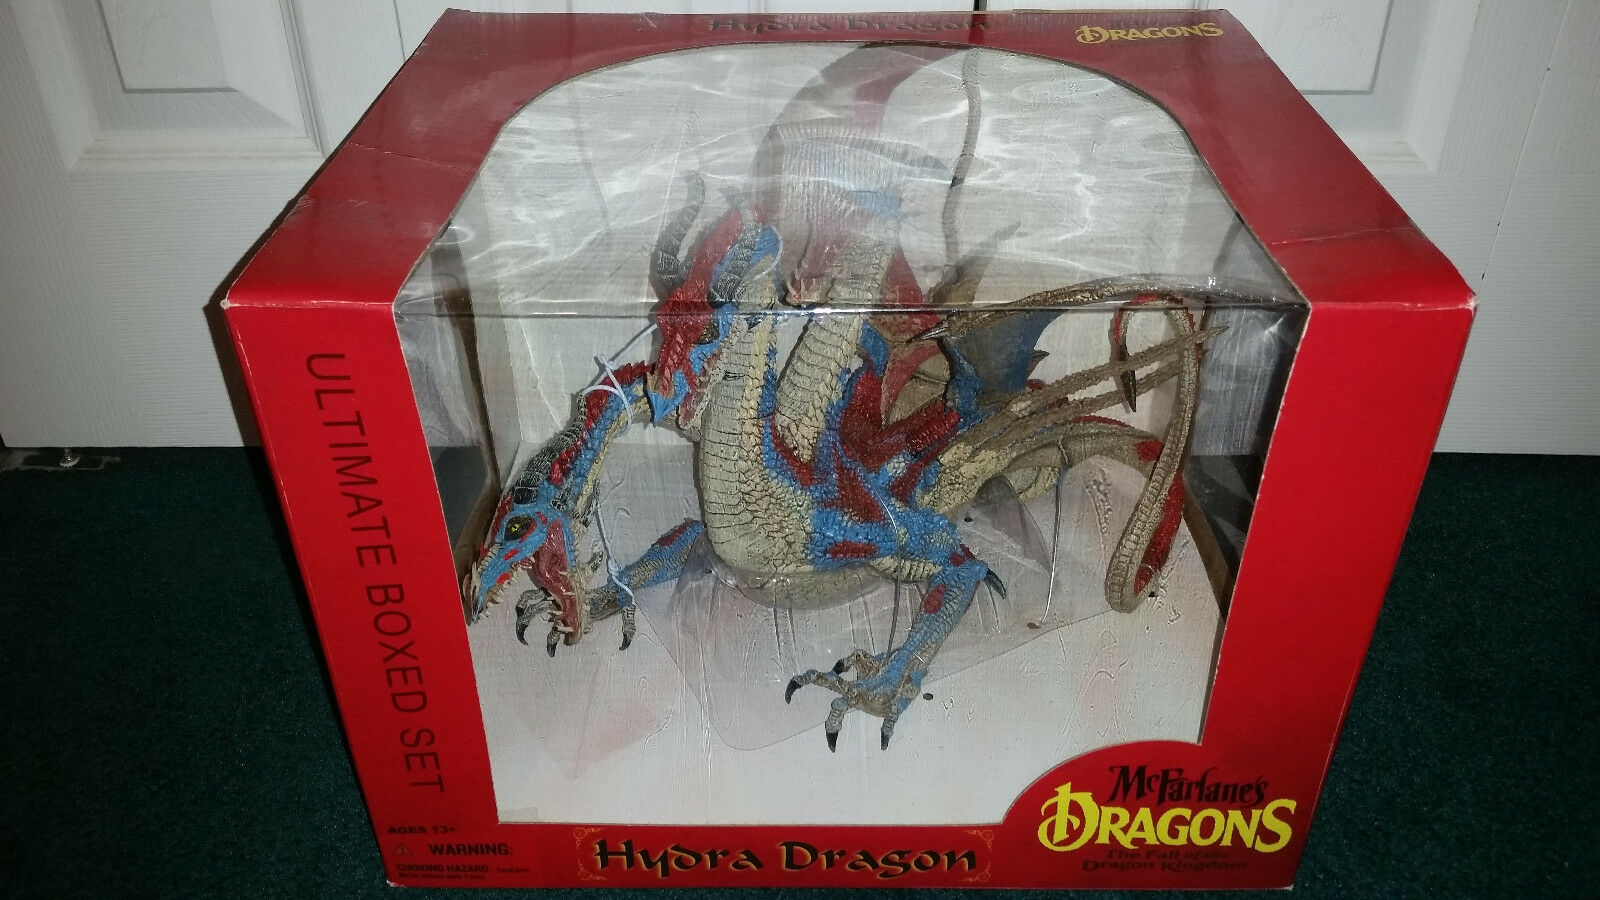 Hydra Dragon Ultimate Boxed Set Dragons Series  7 Mcfarlane Toys 3 HEADS  MISP  édition limitée